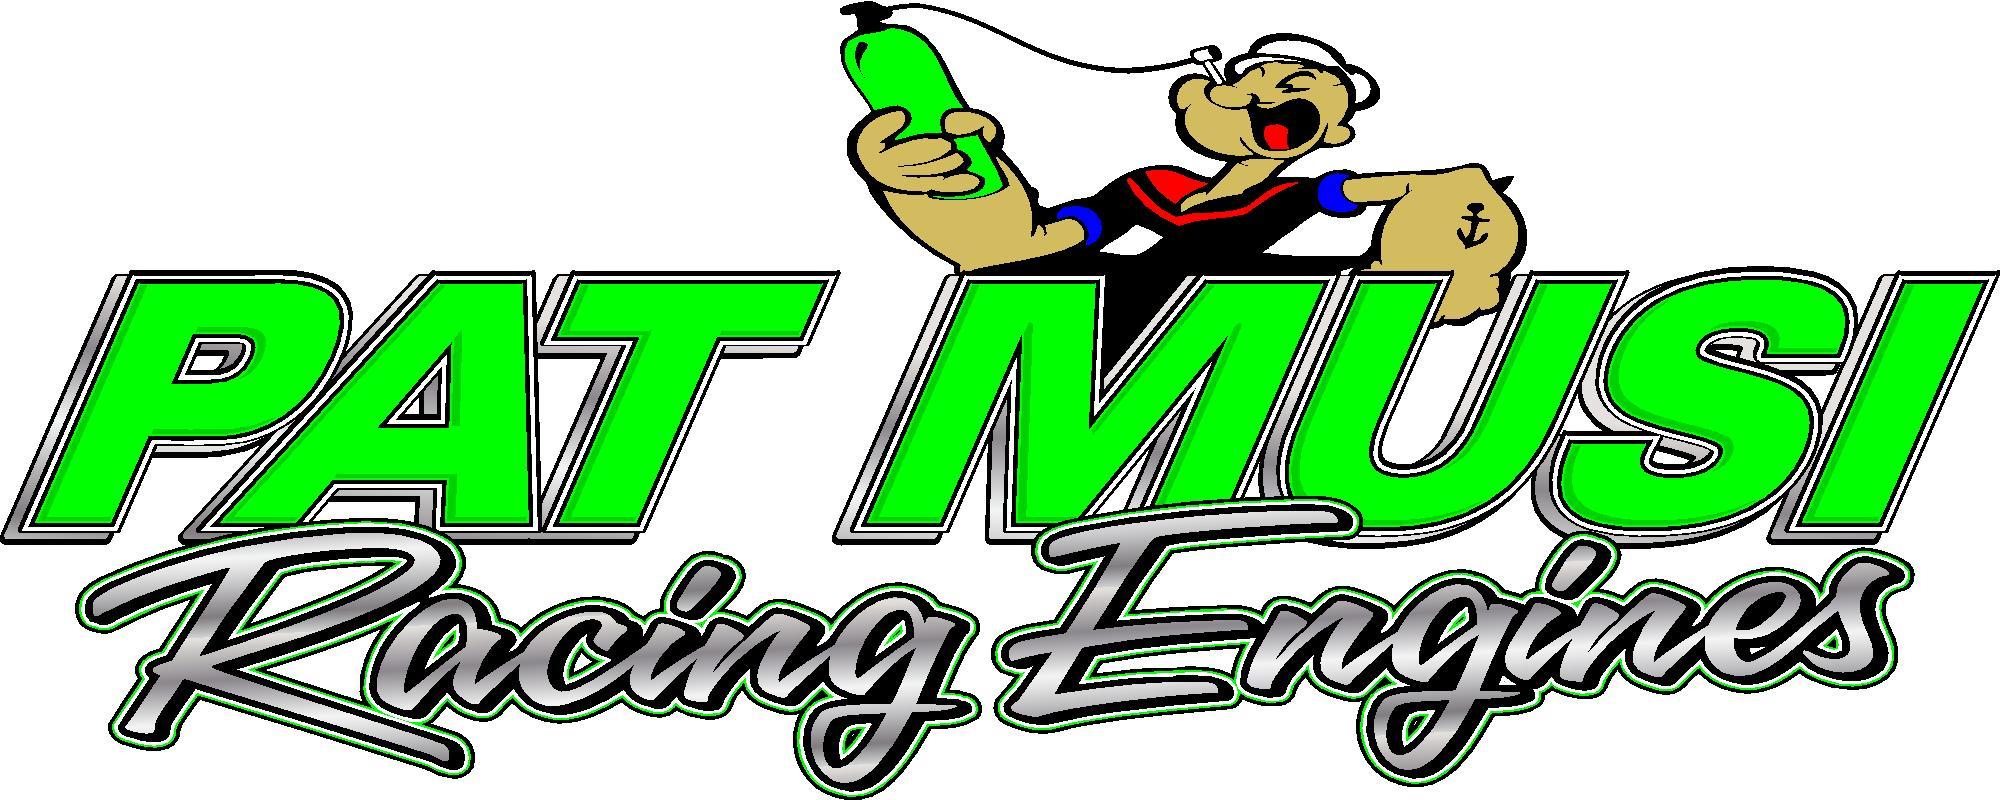 Pat musi racing engines sticker